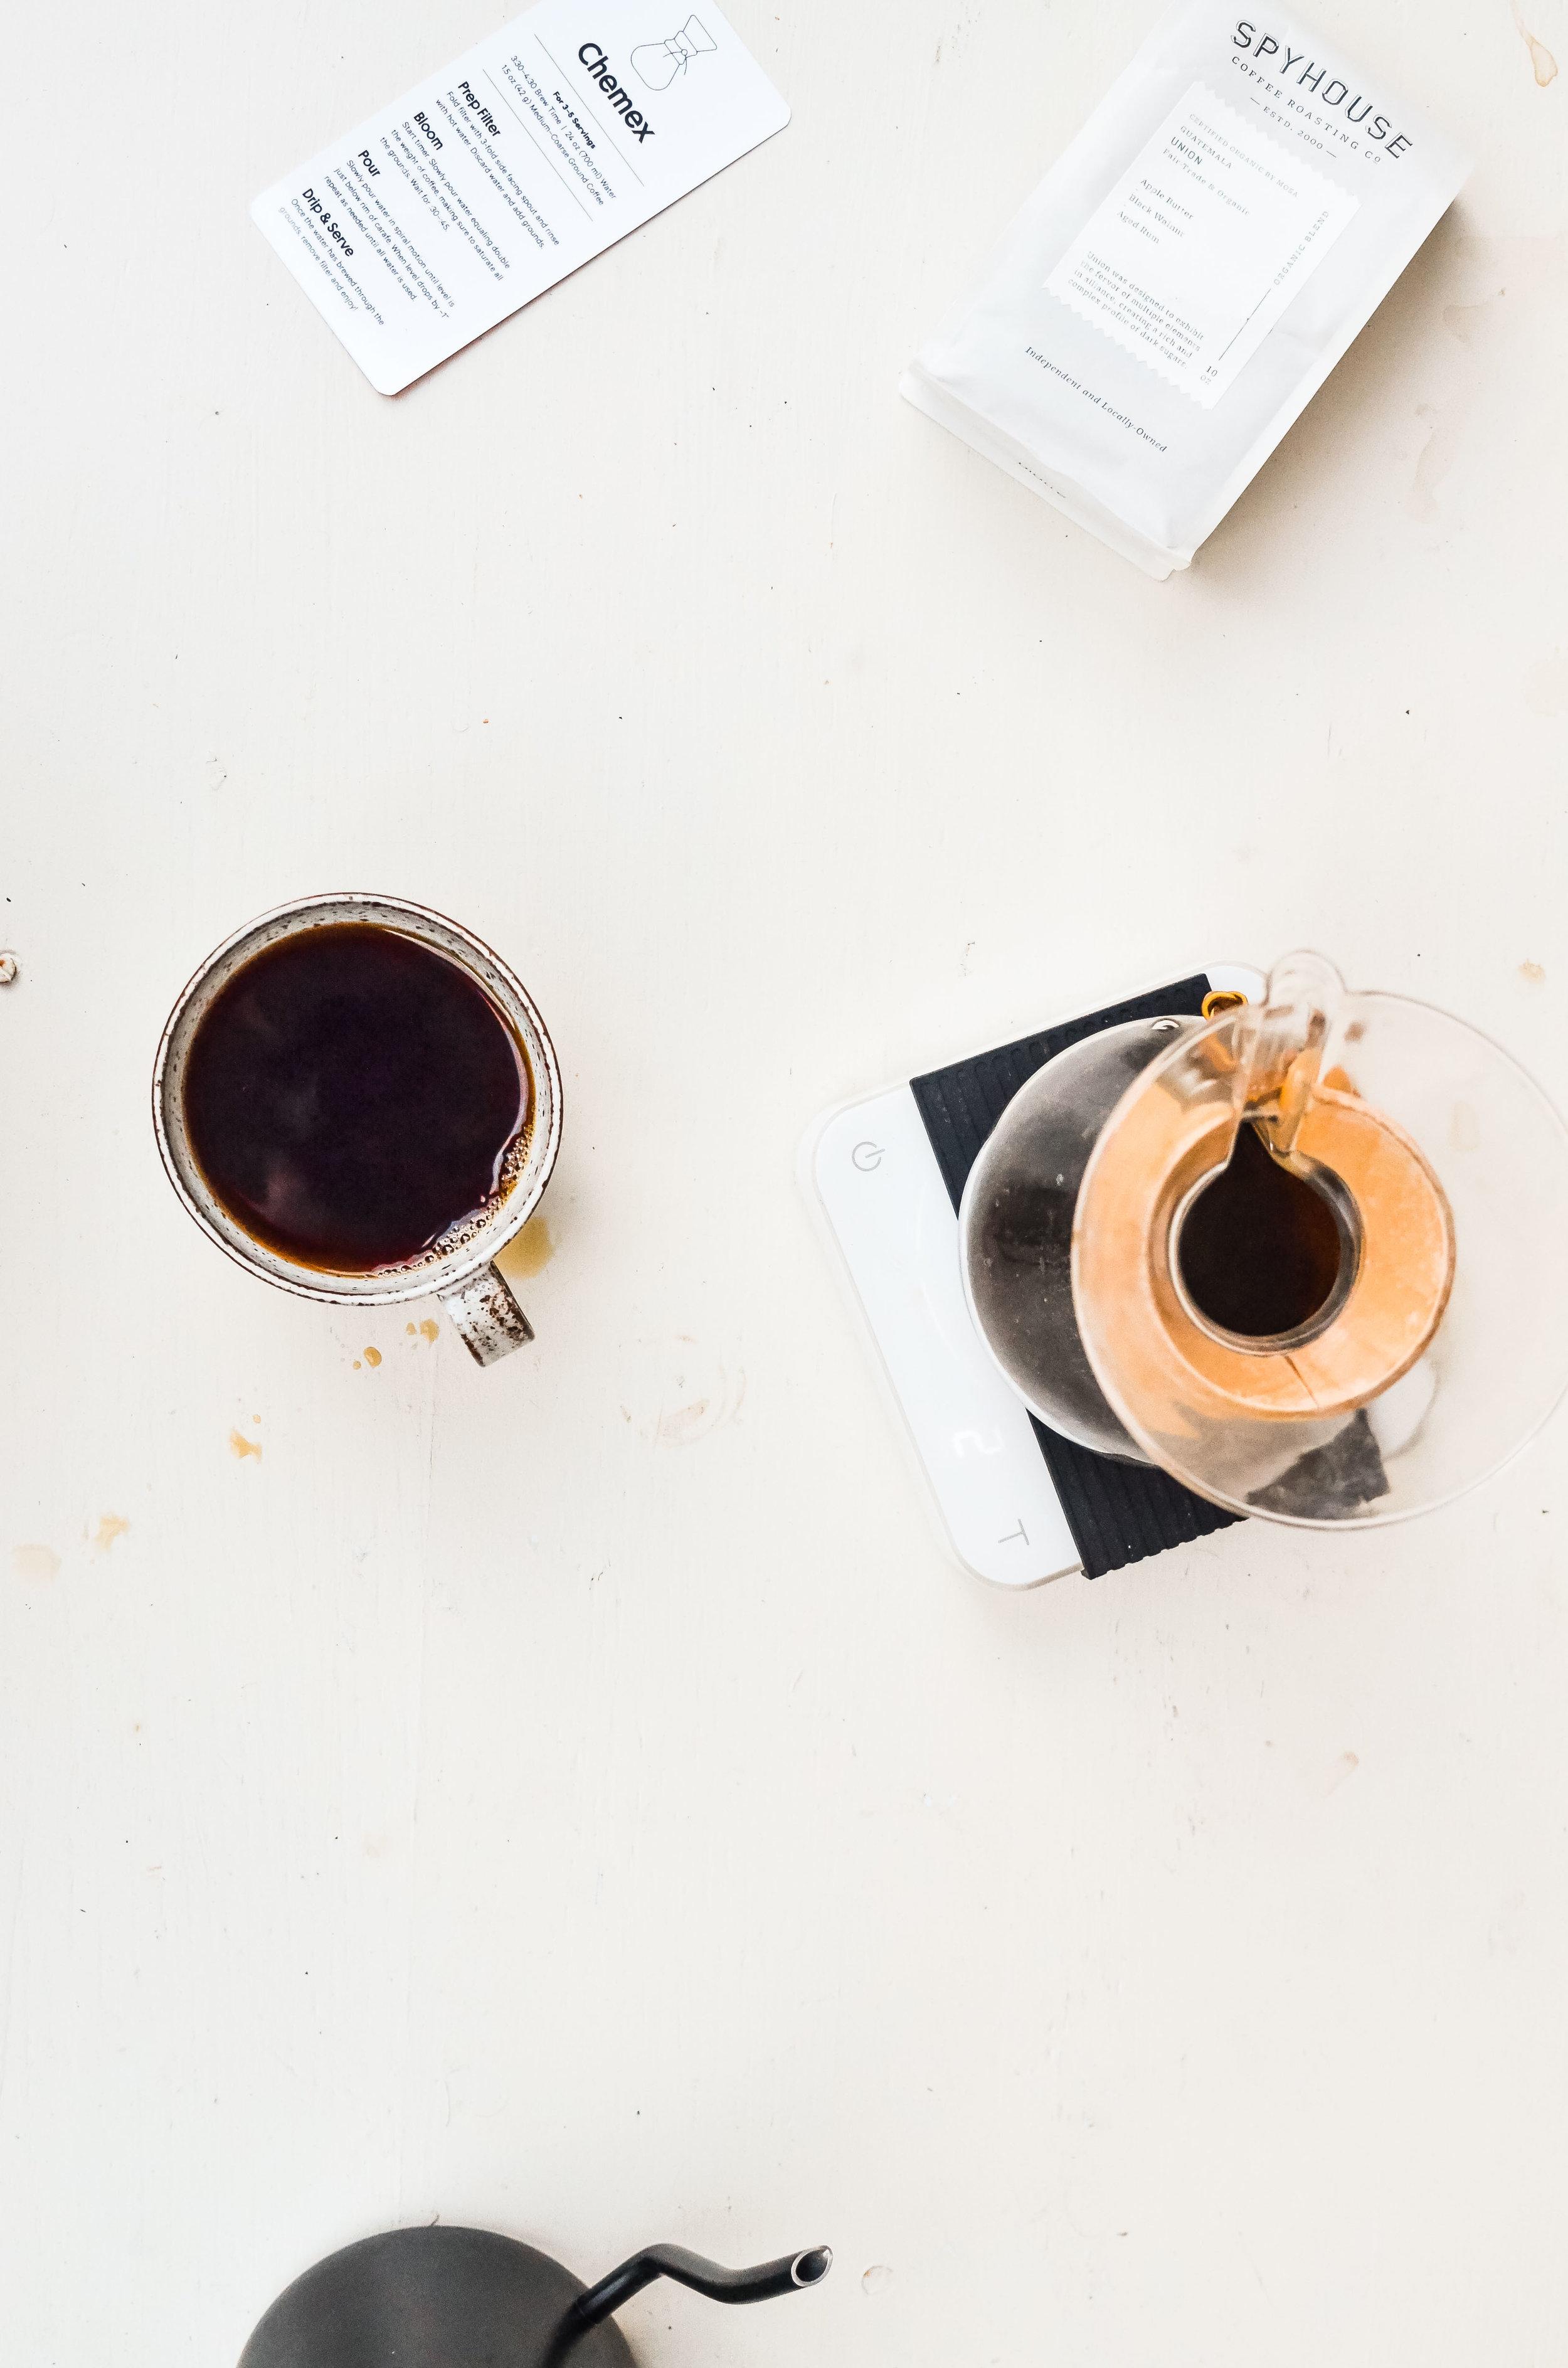 Wendling_Boyd_Trade_Coffee_Co_Spyhouse_Coffee-6.jpg